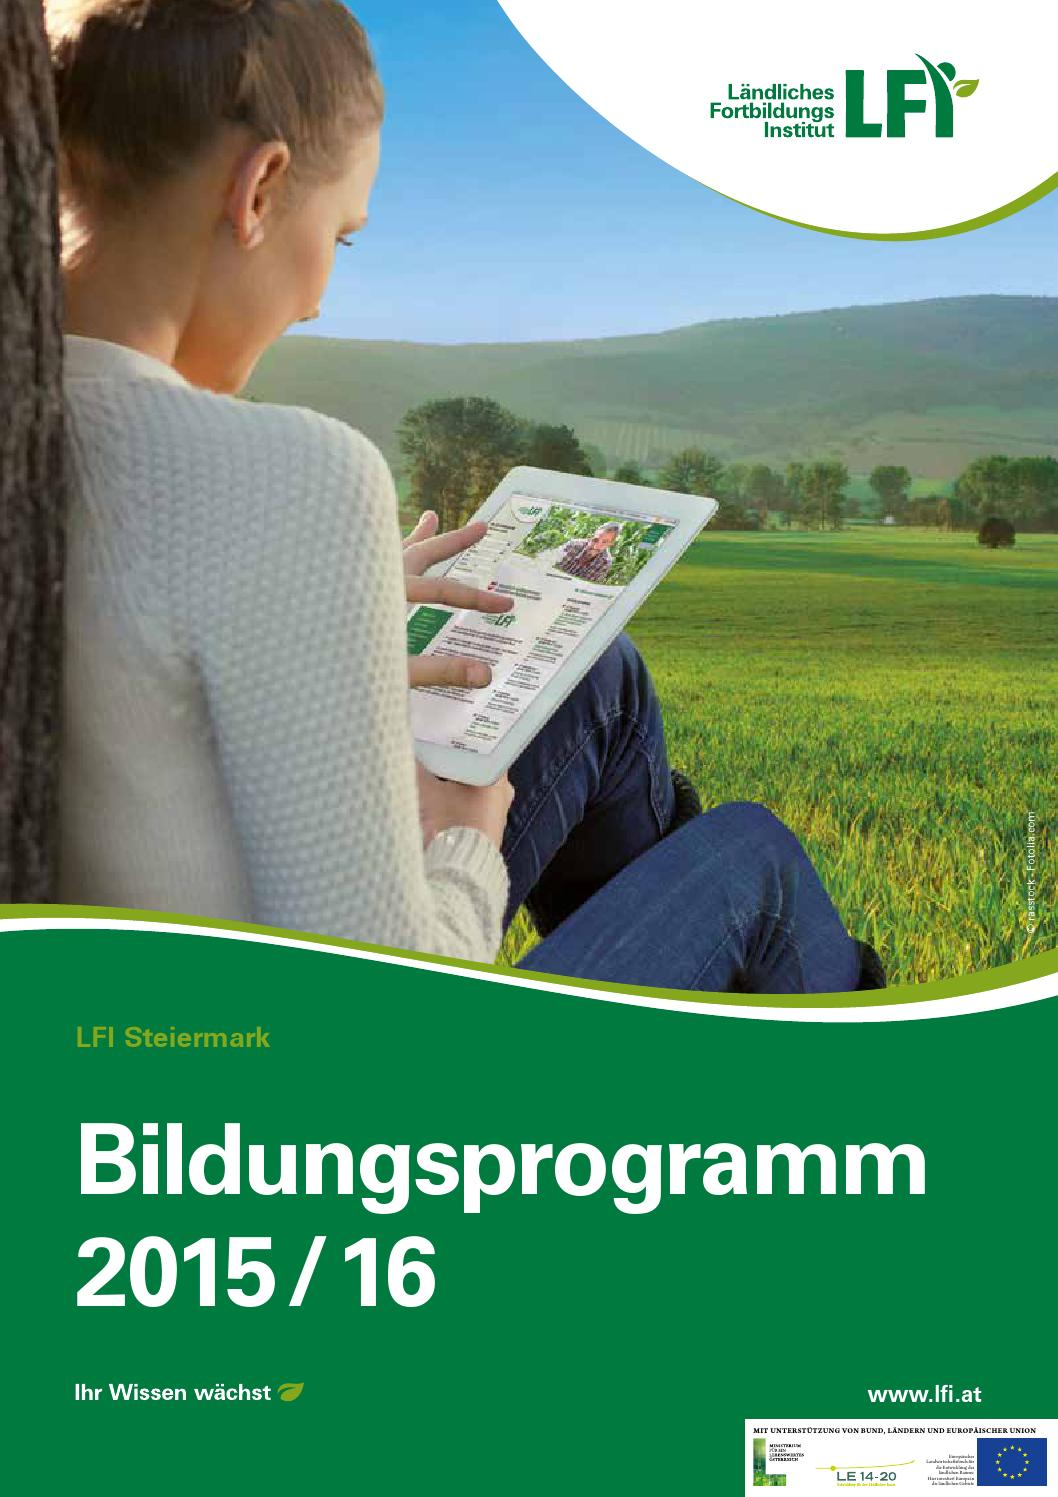 Bildungsprogramm LFI Steiermark 2015/16 by LFI Steiermark - issuu